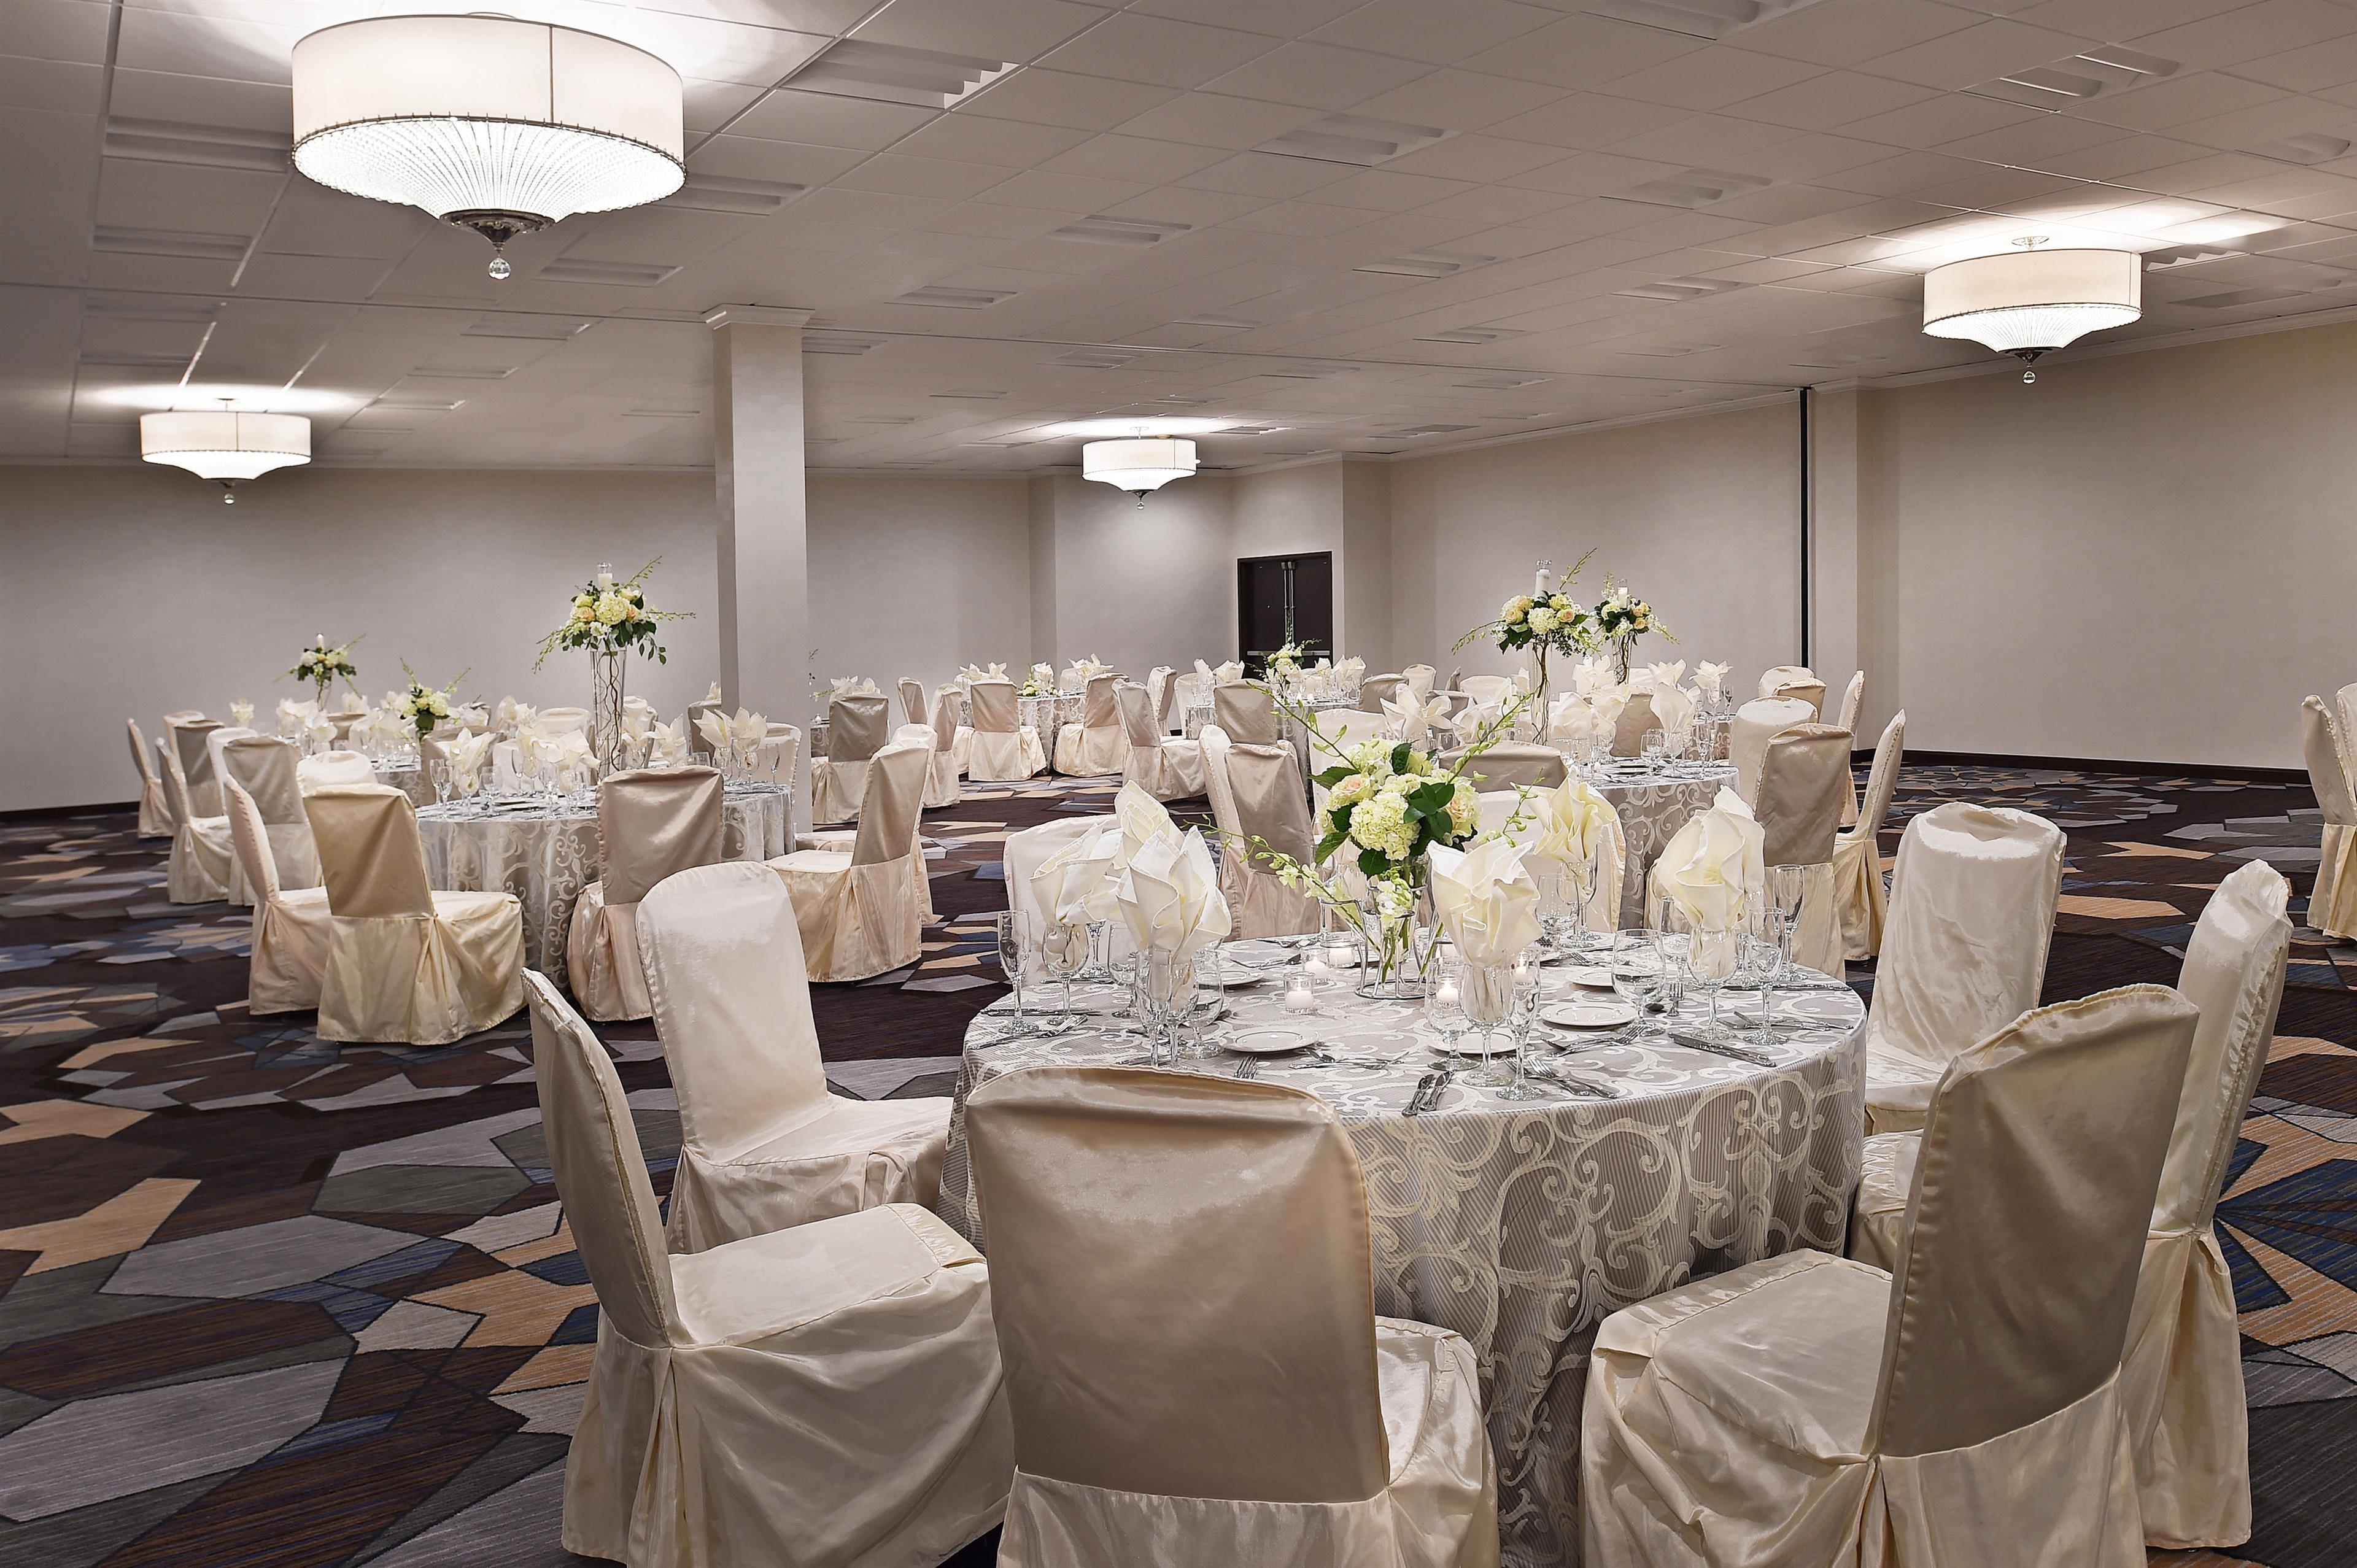 Sheraton Westport Plaza Hotel St. Louis image 21